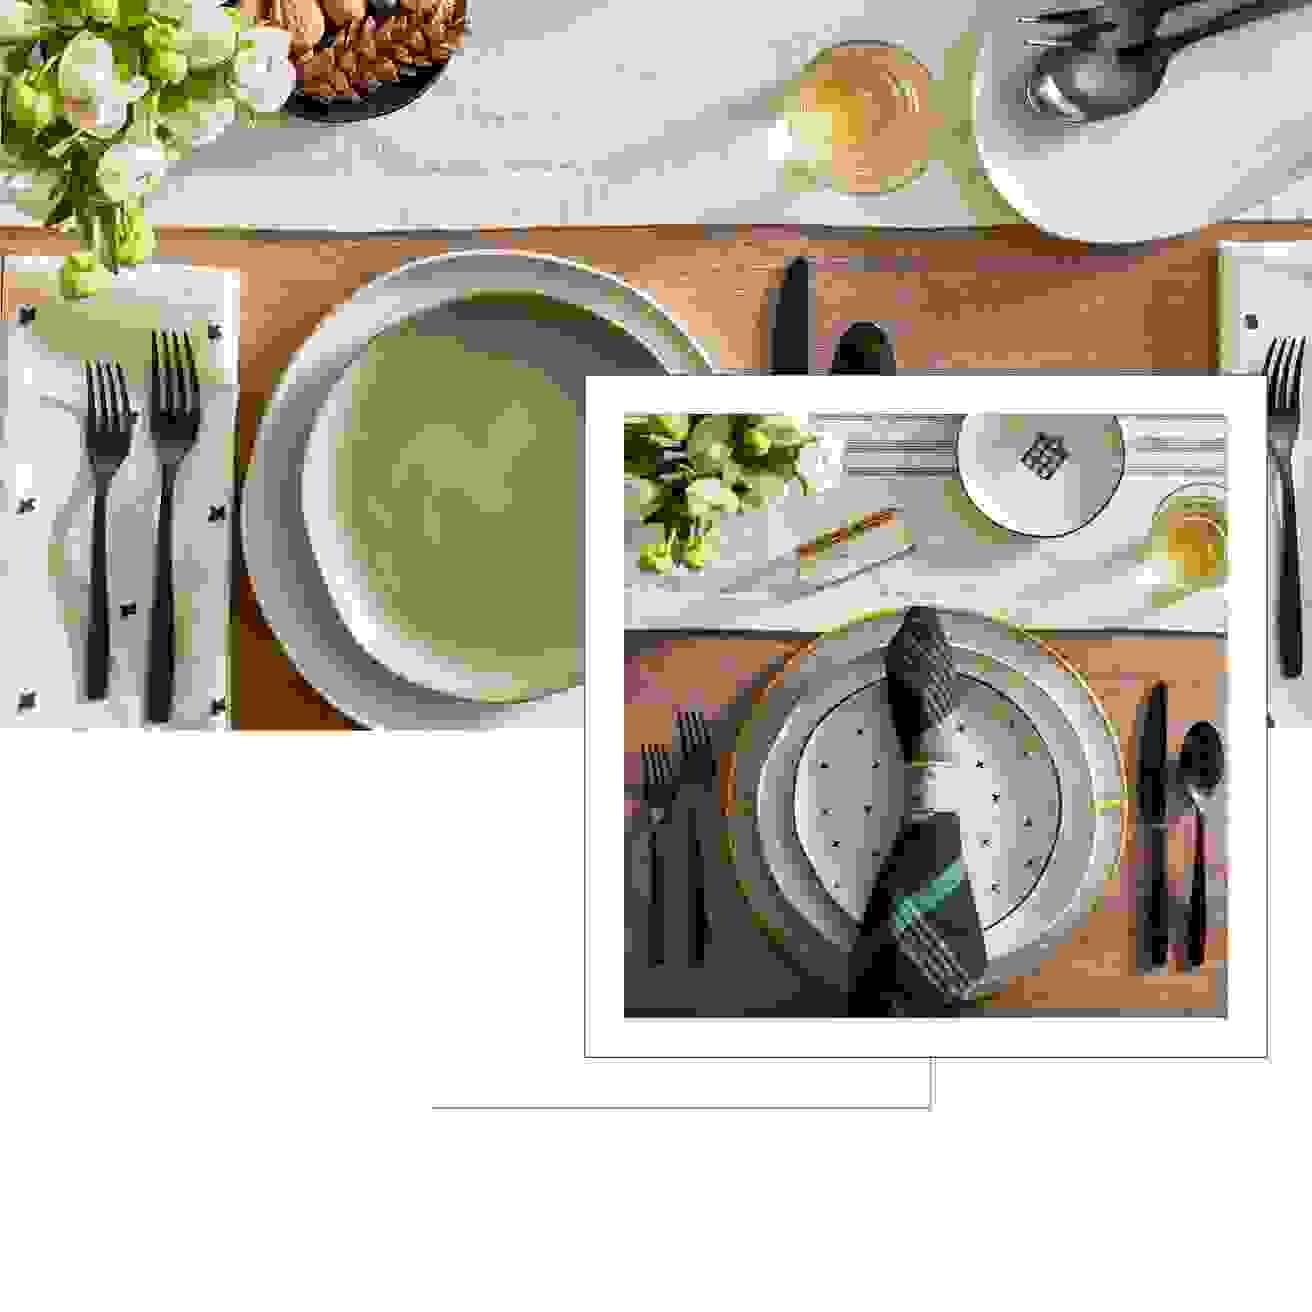 hearth hand with magnolia target. Black Bedroom Furniture Sets. Home Design Ideas